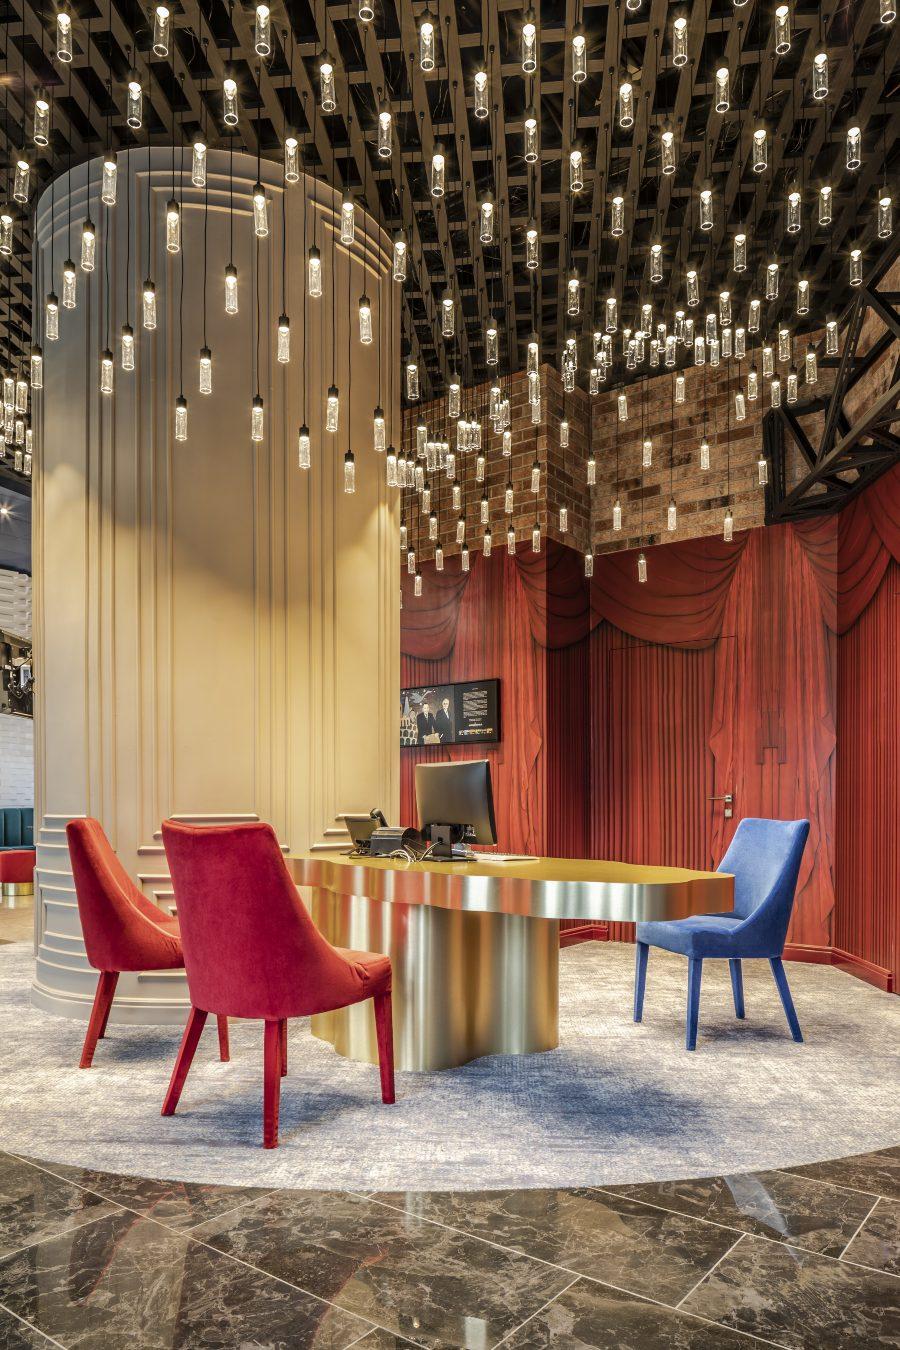 hotel mercure kalinigrad Hotel Mercure Kalinigrad: A Fairytale In Russia hotel mercure kalinigrad fairytale russia 6